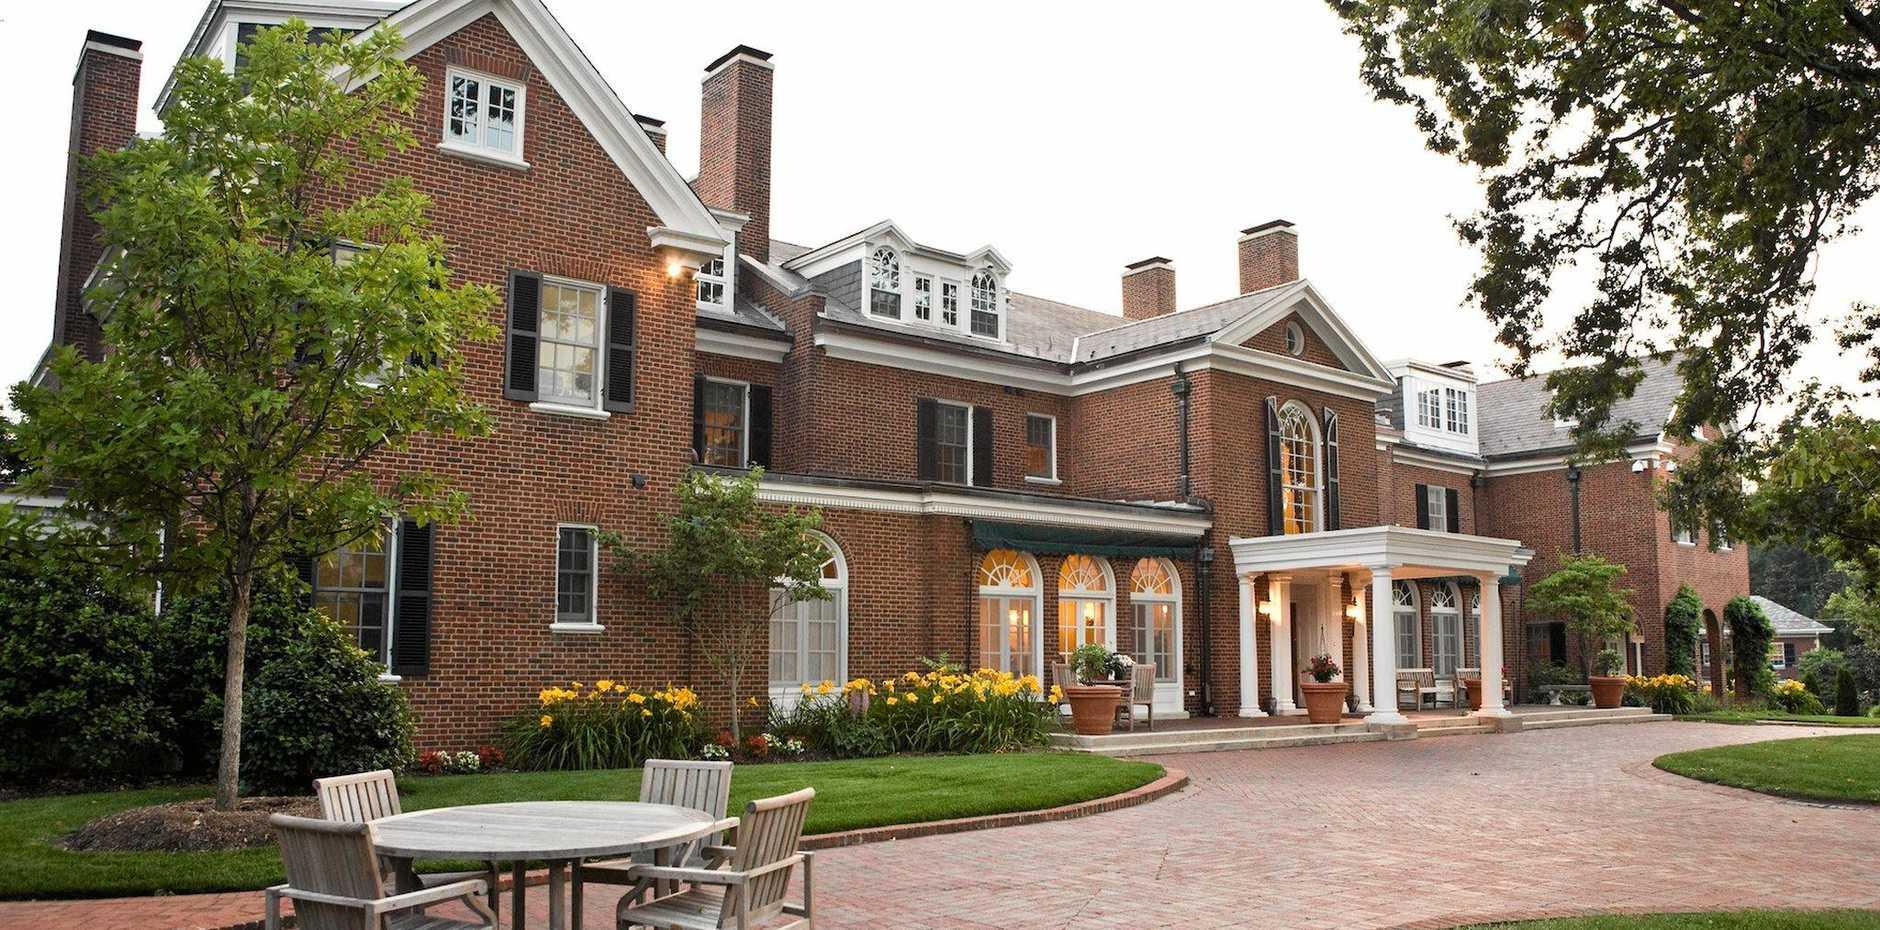 The Australian Ambassador's Residence in Washington D.C.